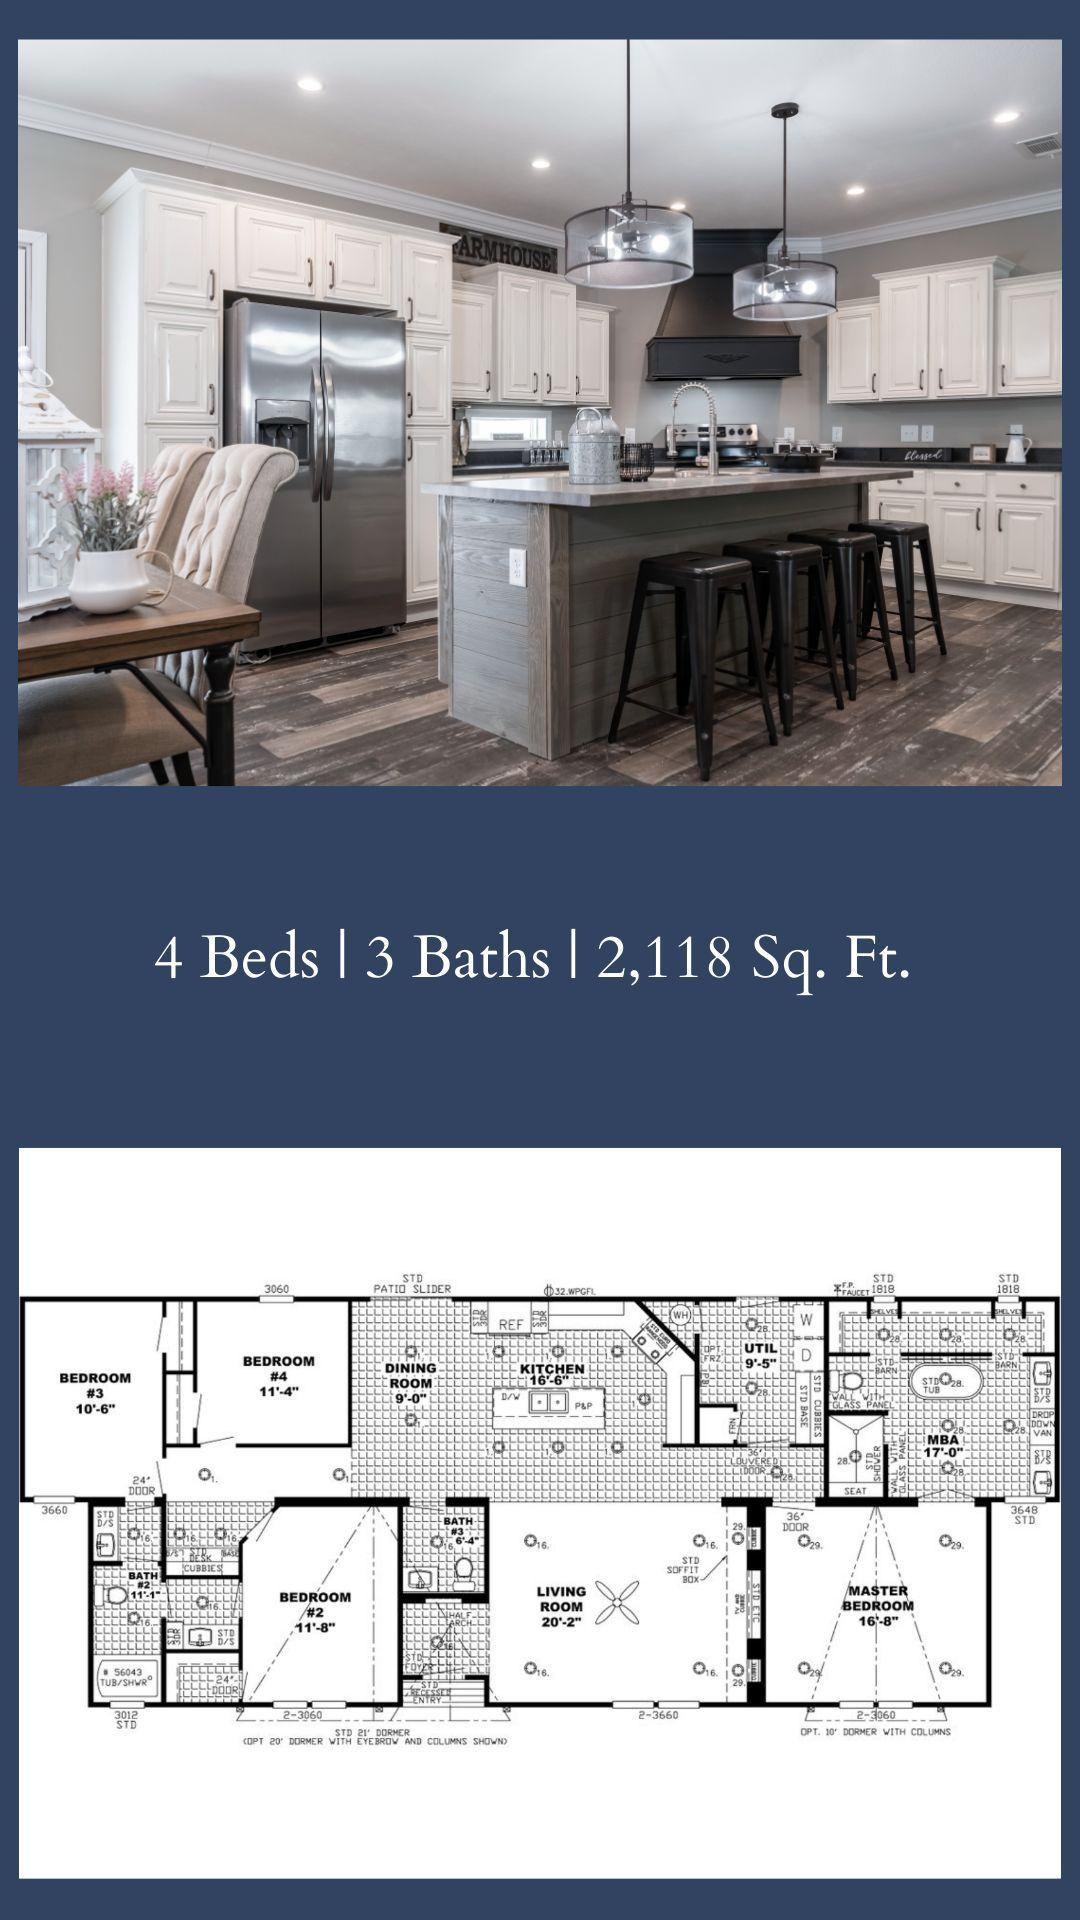 Click For 3d Tour 120k 58car32663ah Mobile Home Floor Plans Modular Home Floor Plans Manufactured Home